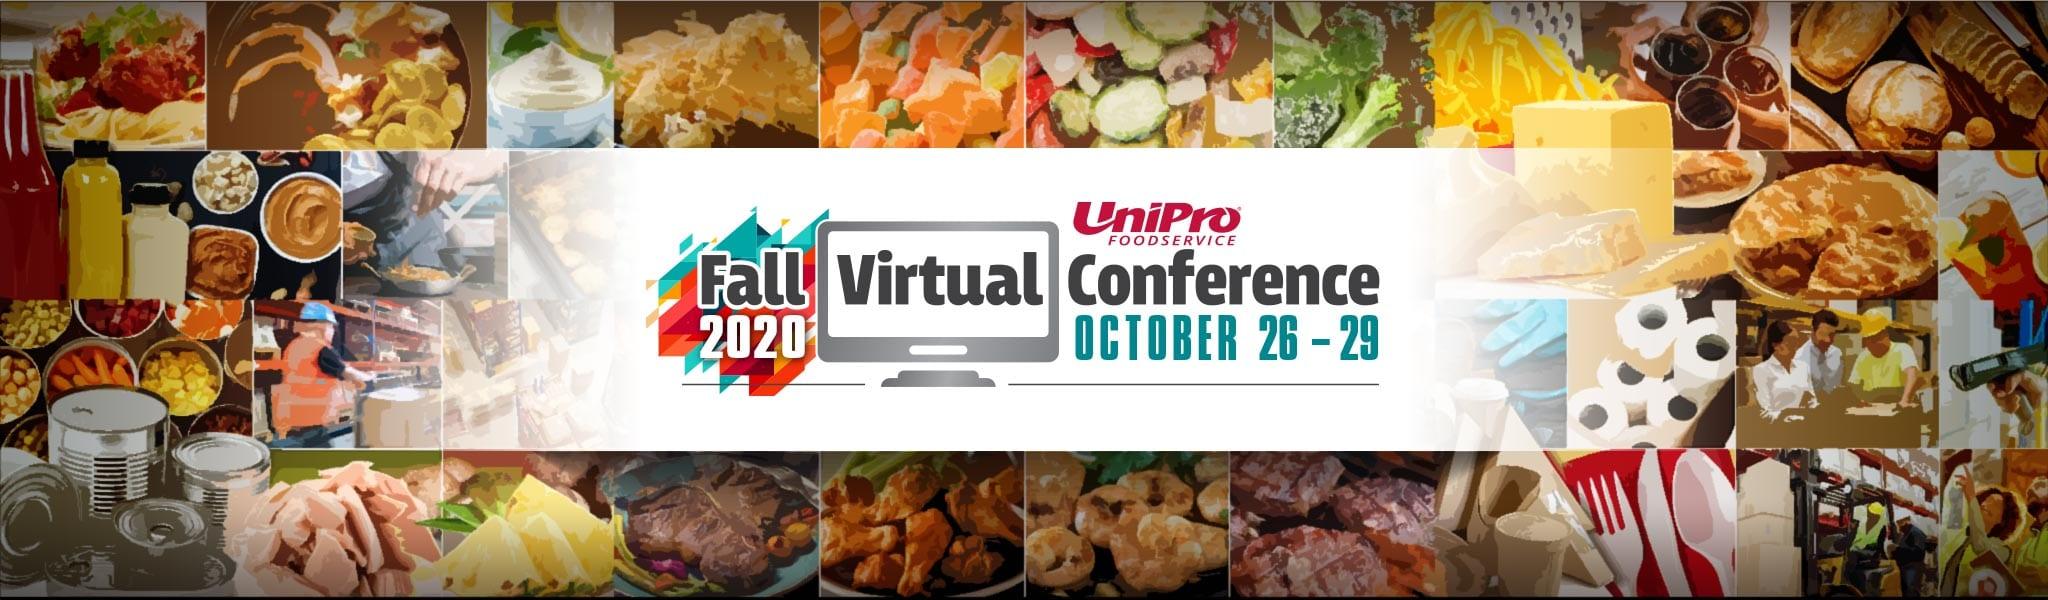 2020 Fall Conference Slider Background